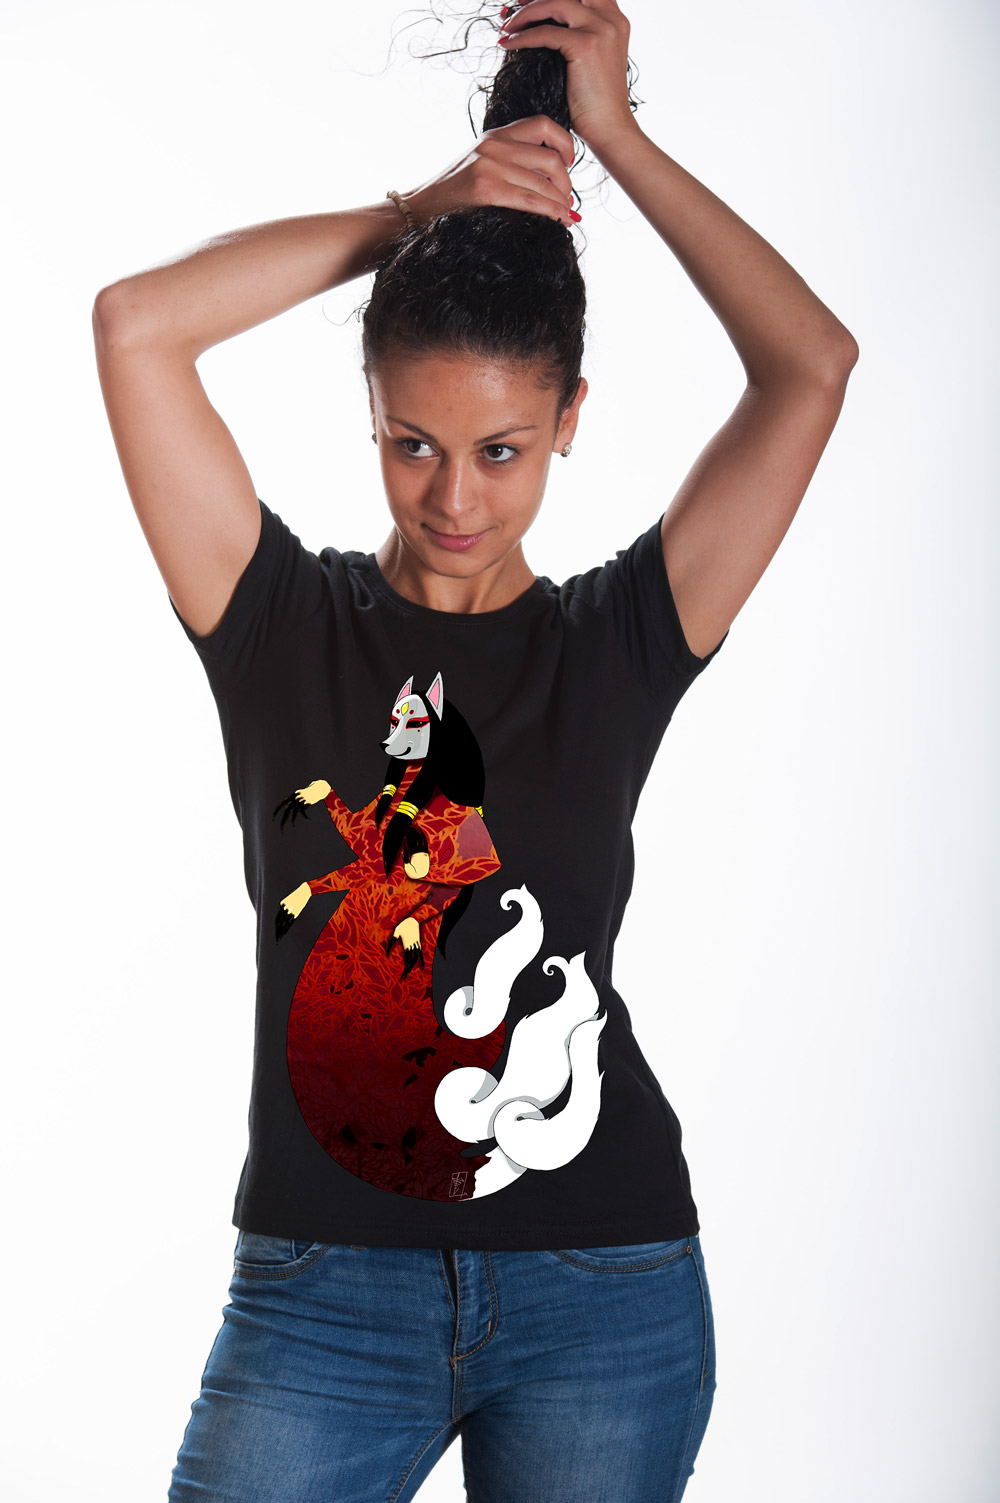 Kitsune T shirt | Mythic Tee | Fox Tshirt | Unisex Kitsune Shirt